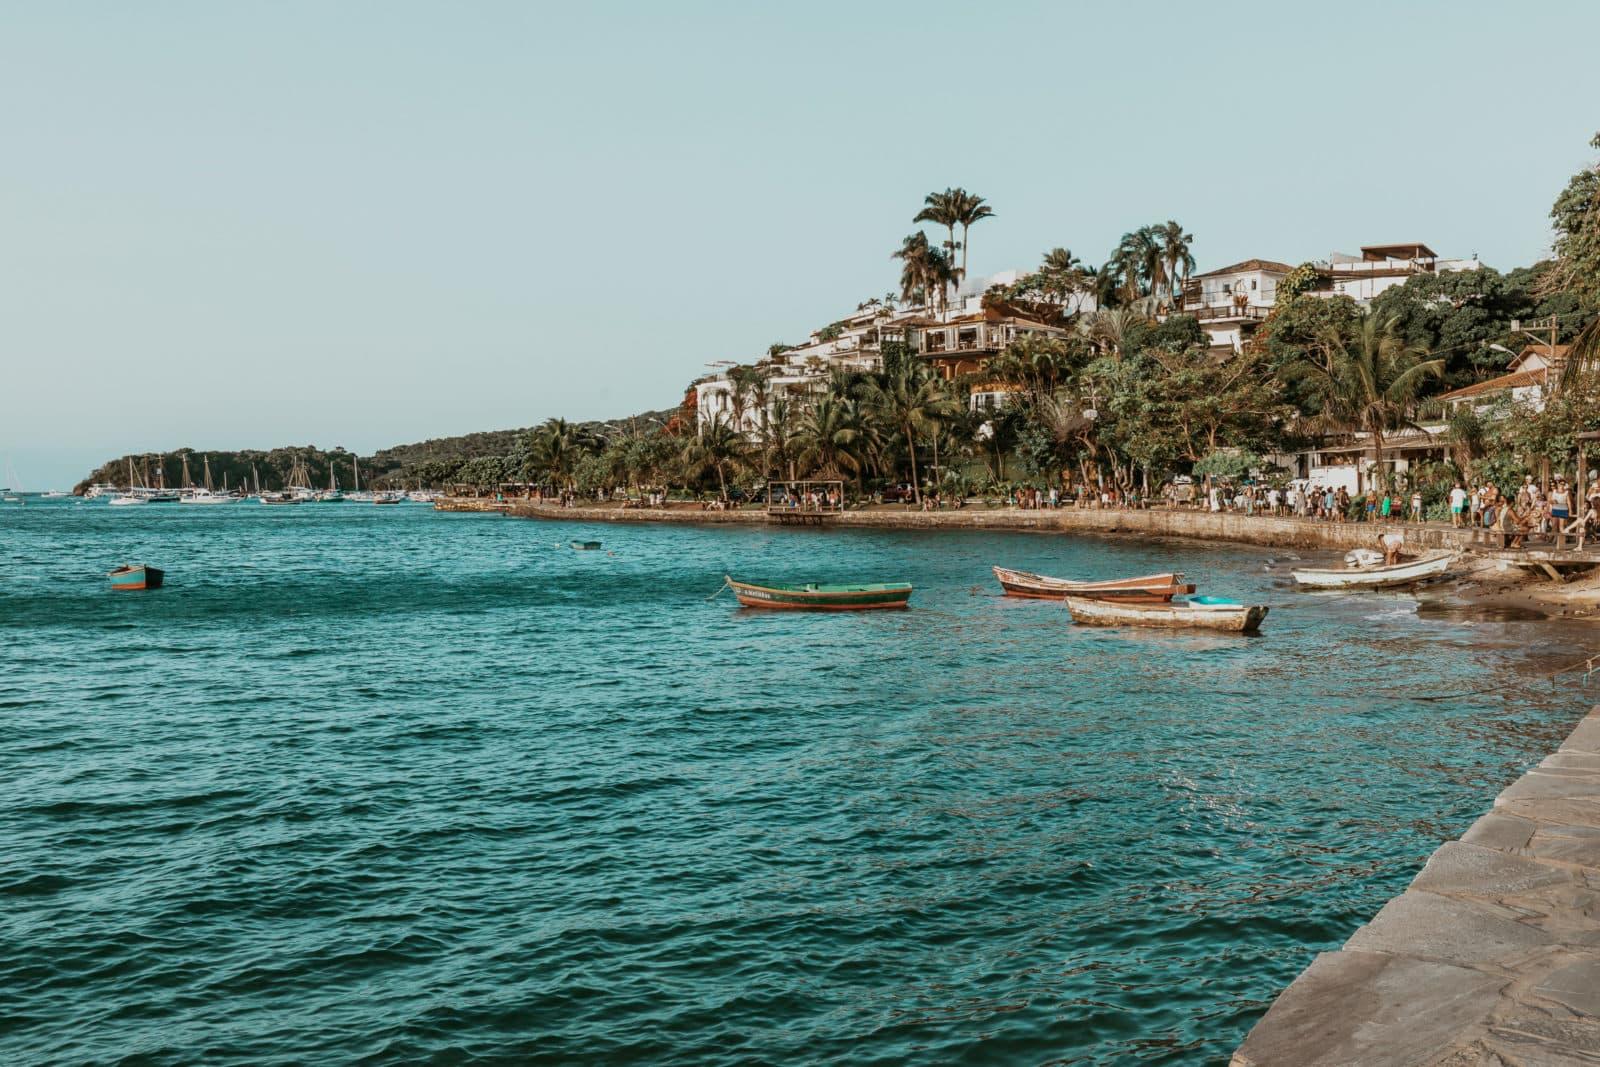 Búzios and its beaches: From a fishing village to the beach hotspot near Rio de Janeiro 6